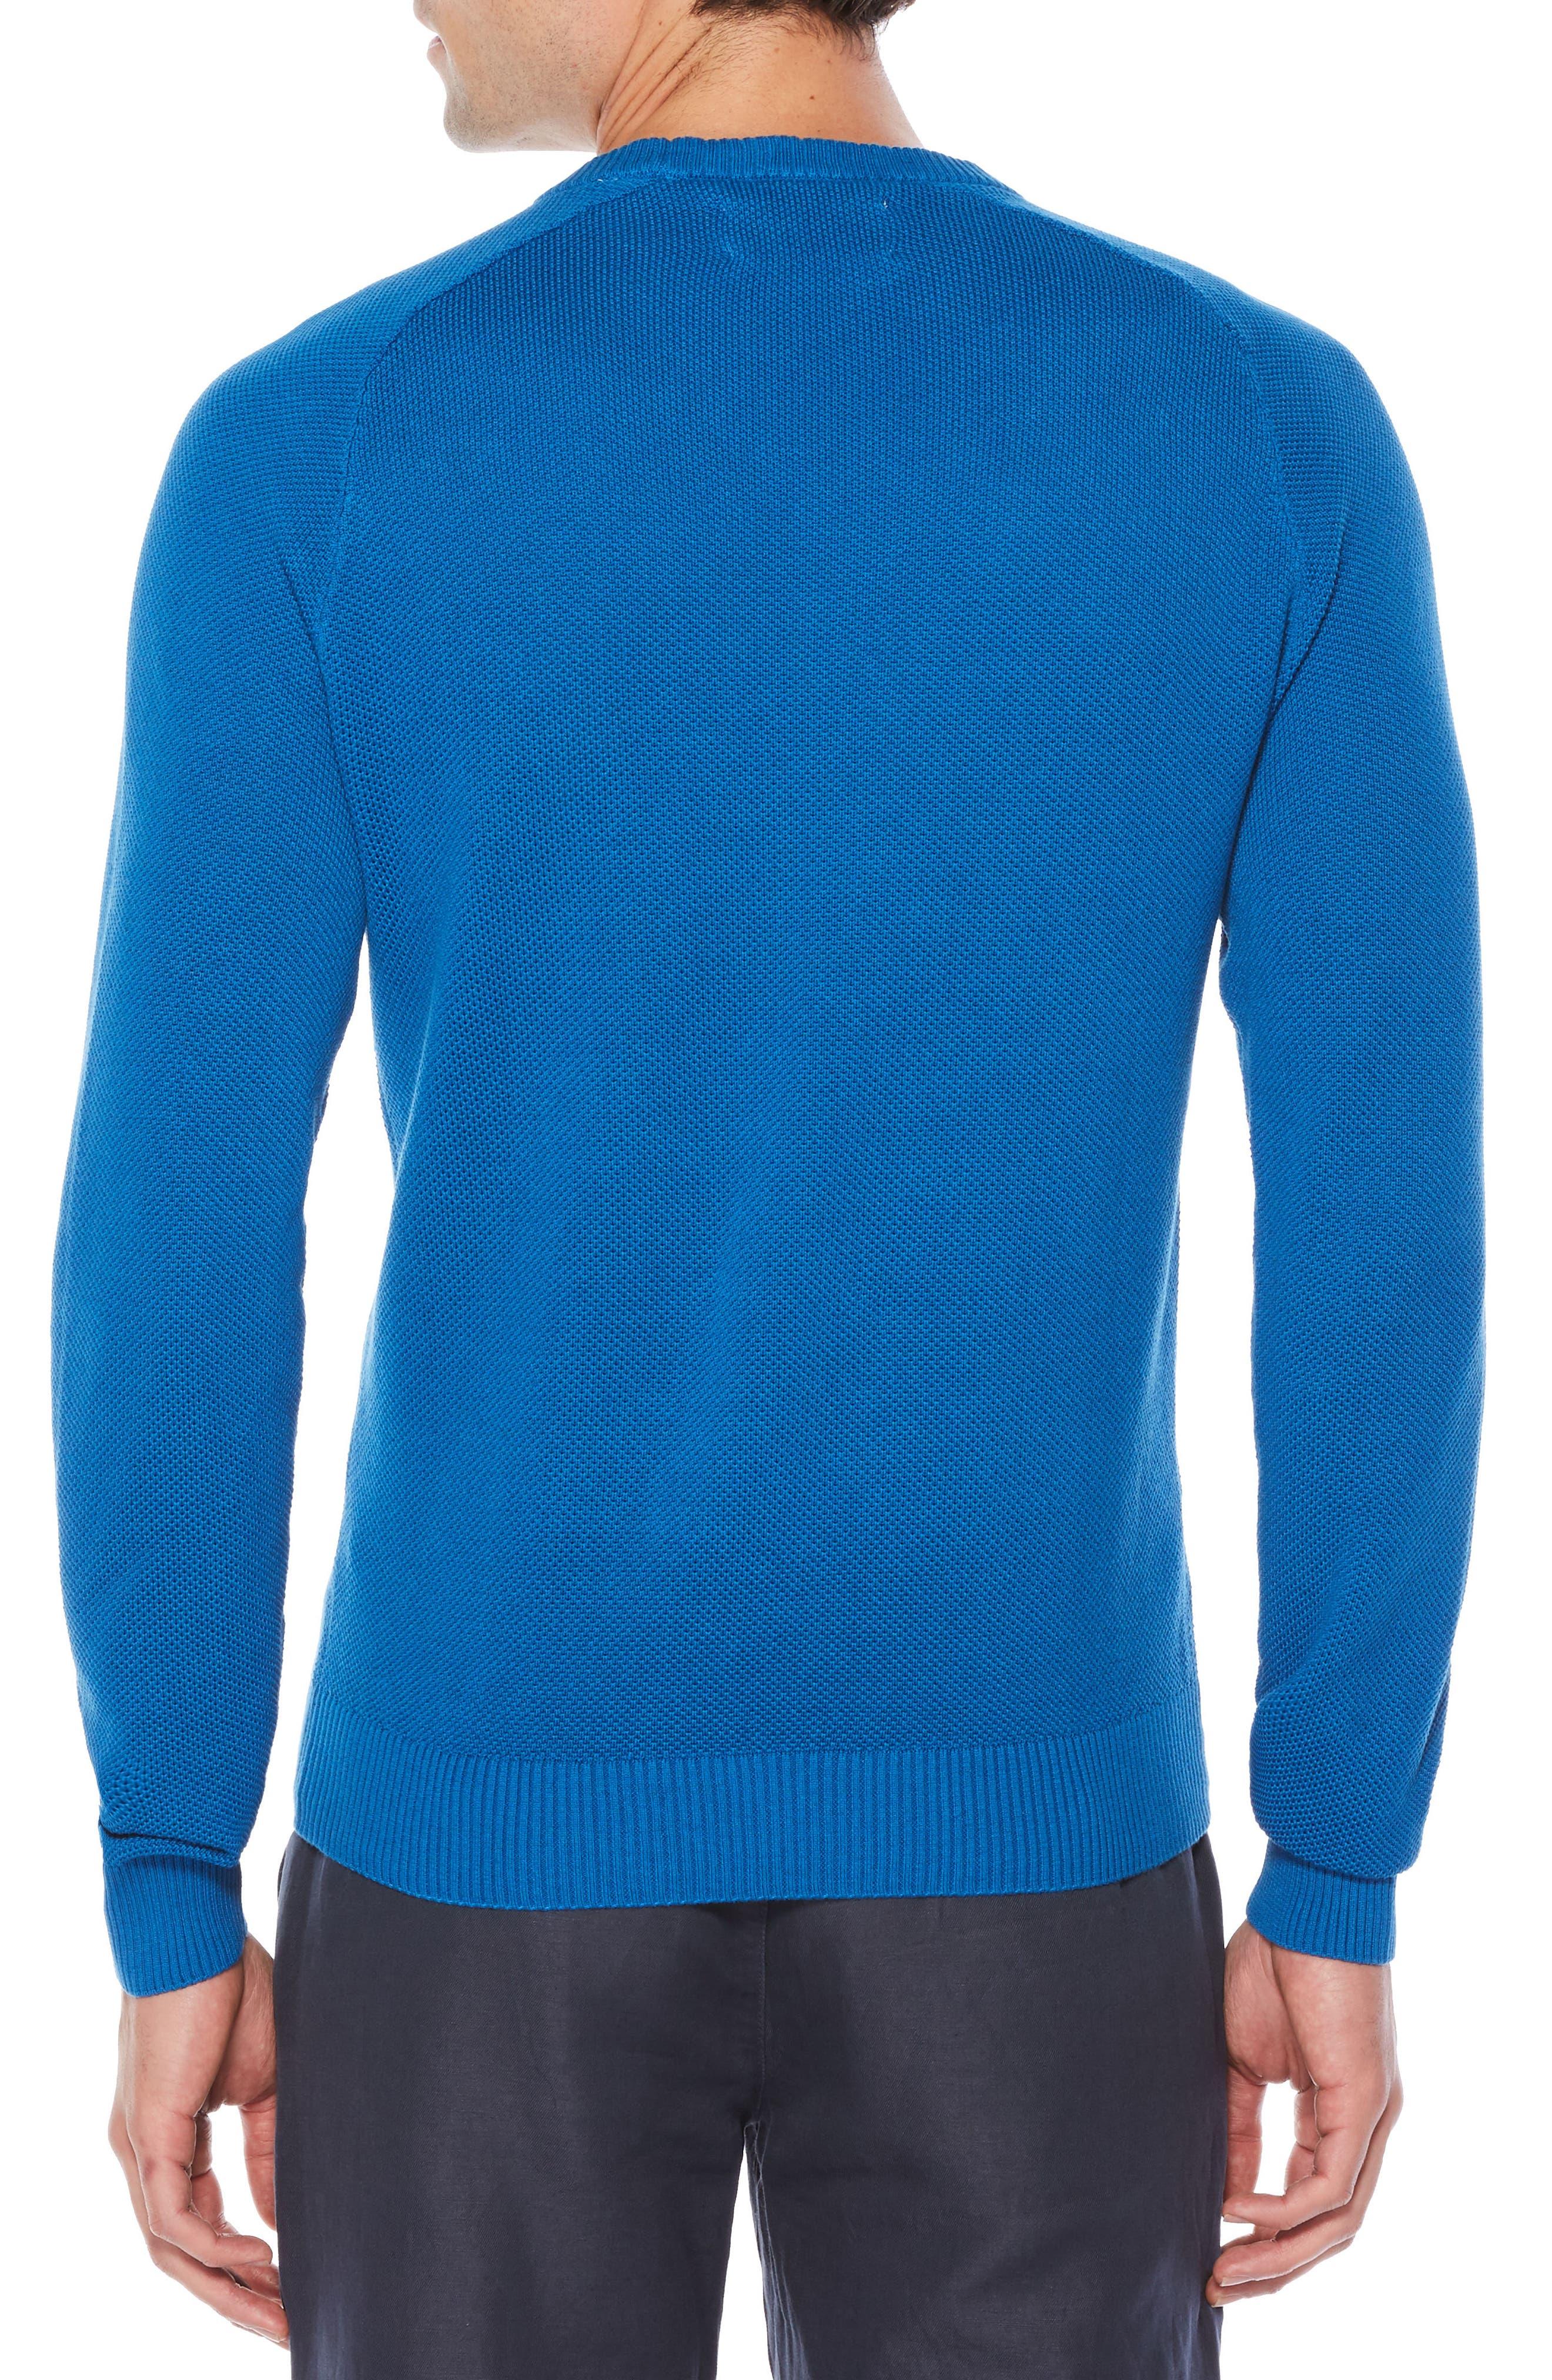 Honeycomb Piqué Sweater,                             Alternate thumbnail 2, color,                             403